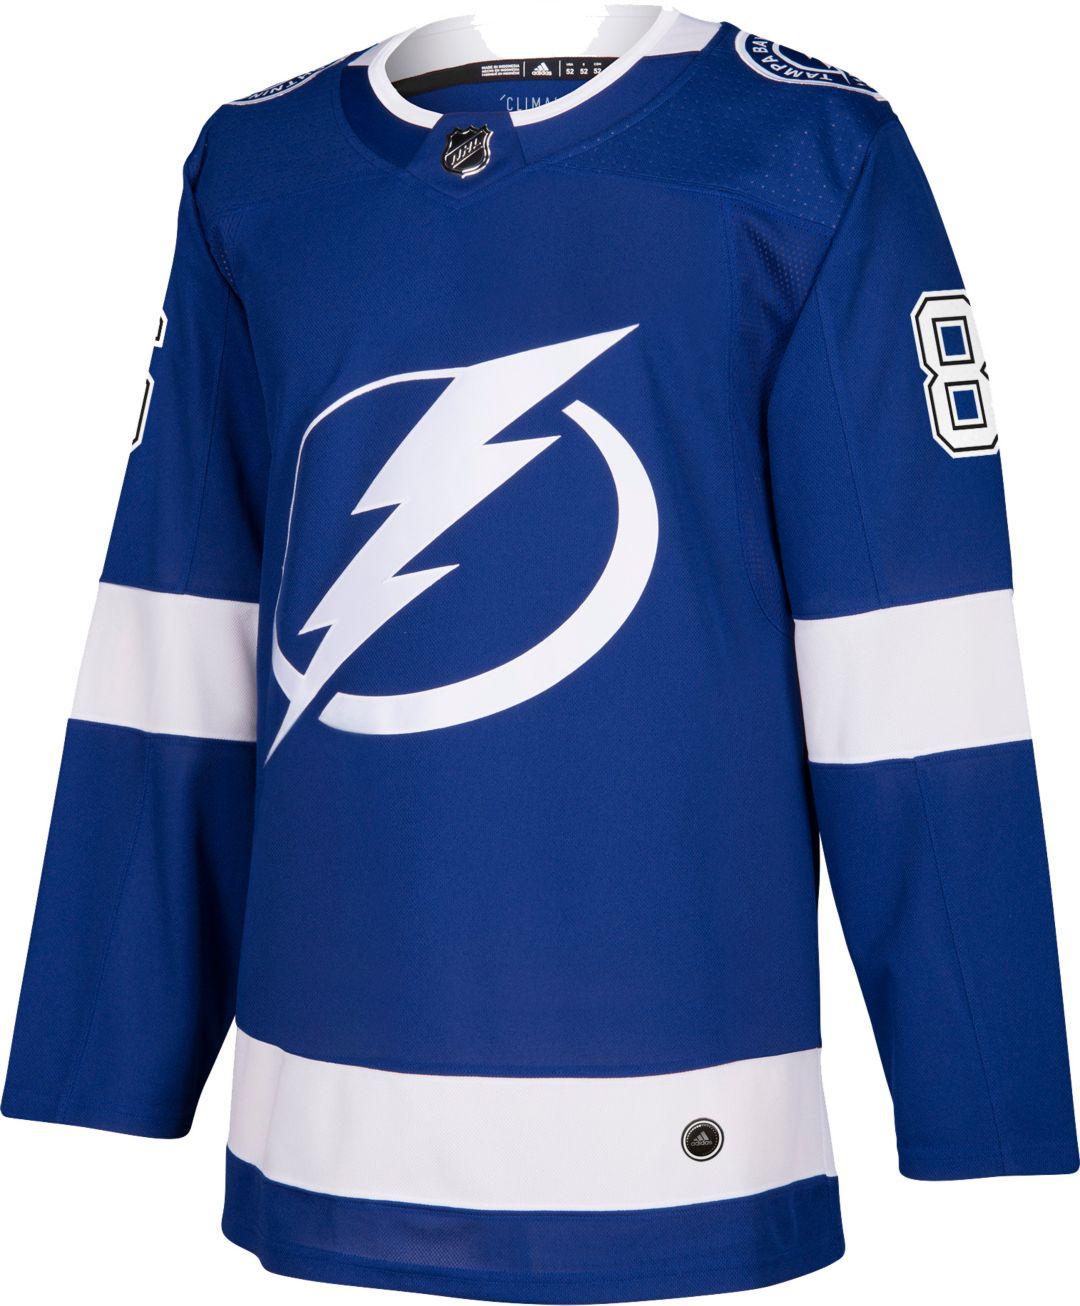 low priced fab40 1df59 adidas Men's Tampa Bay Lightning Nikita Kucherov #86 Authentic Pro Home  Jersey